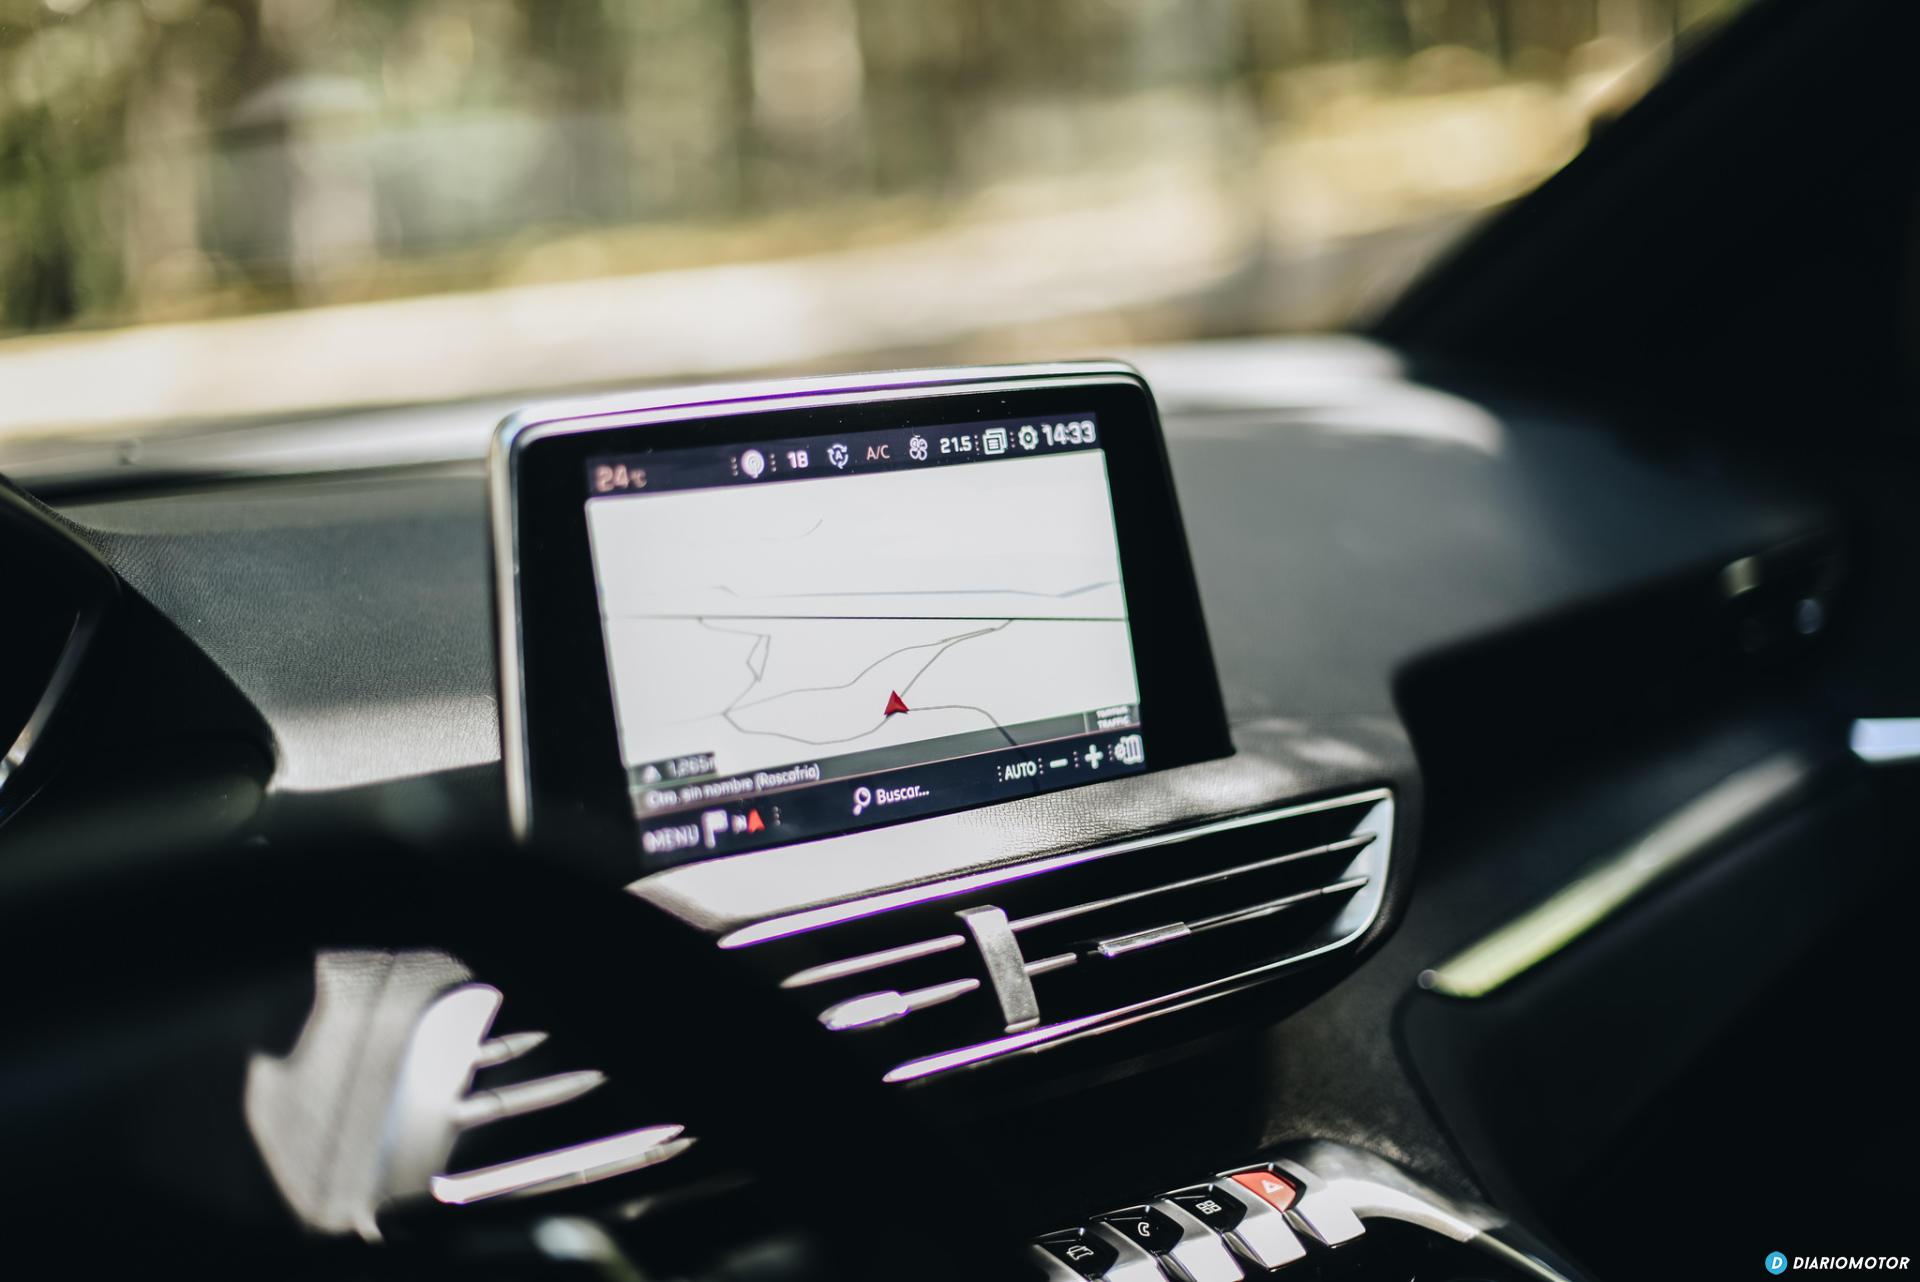 Peugeot 3008 Prueba Video 2